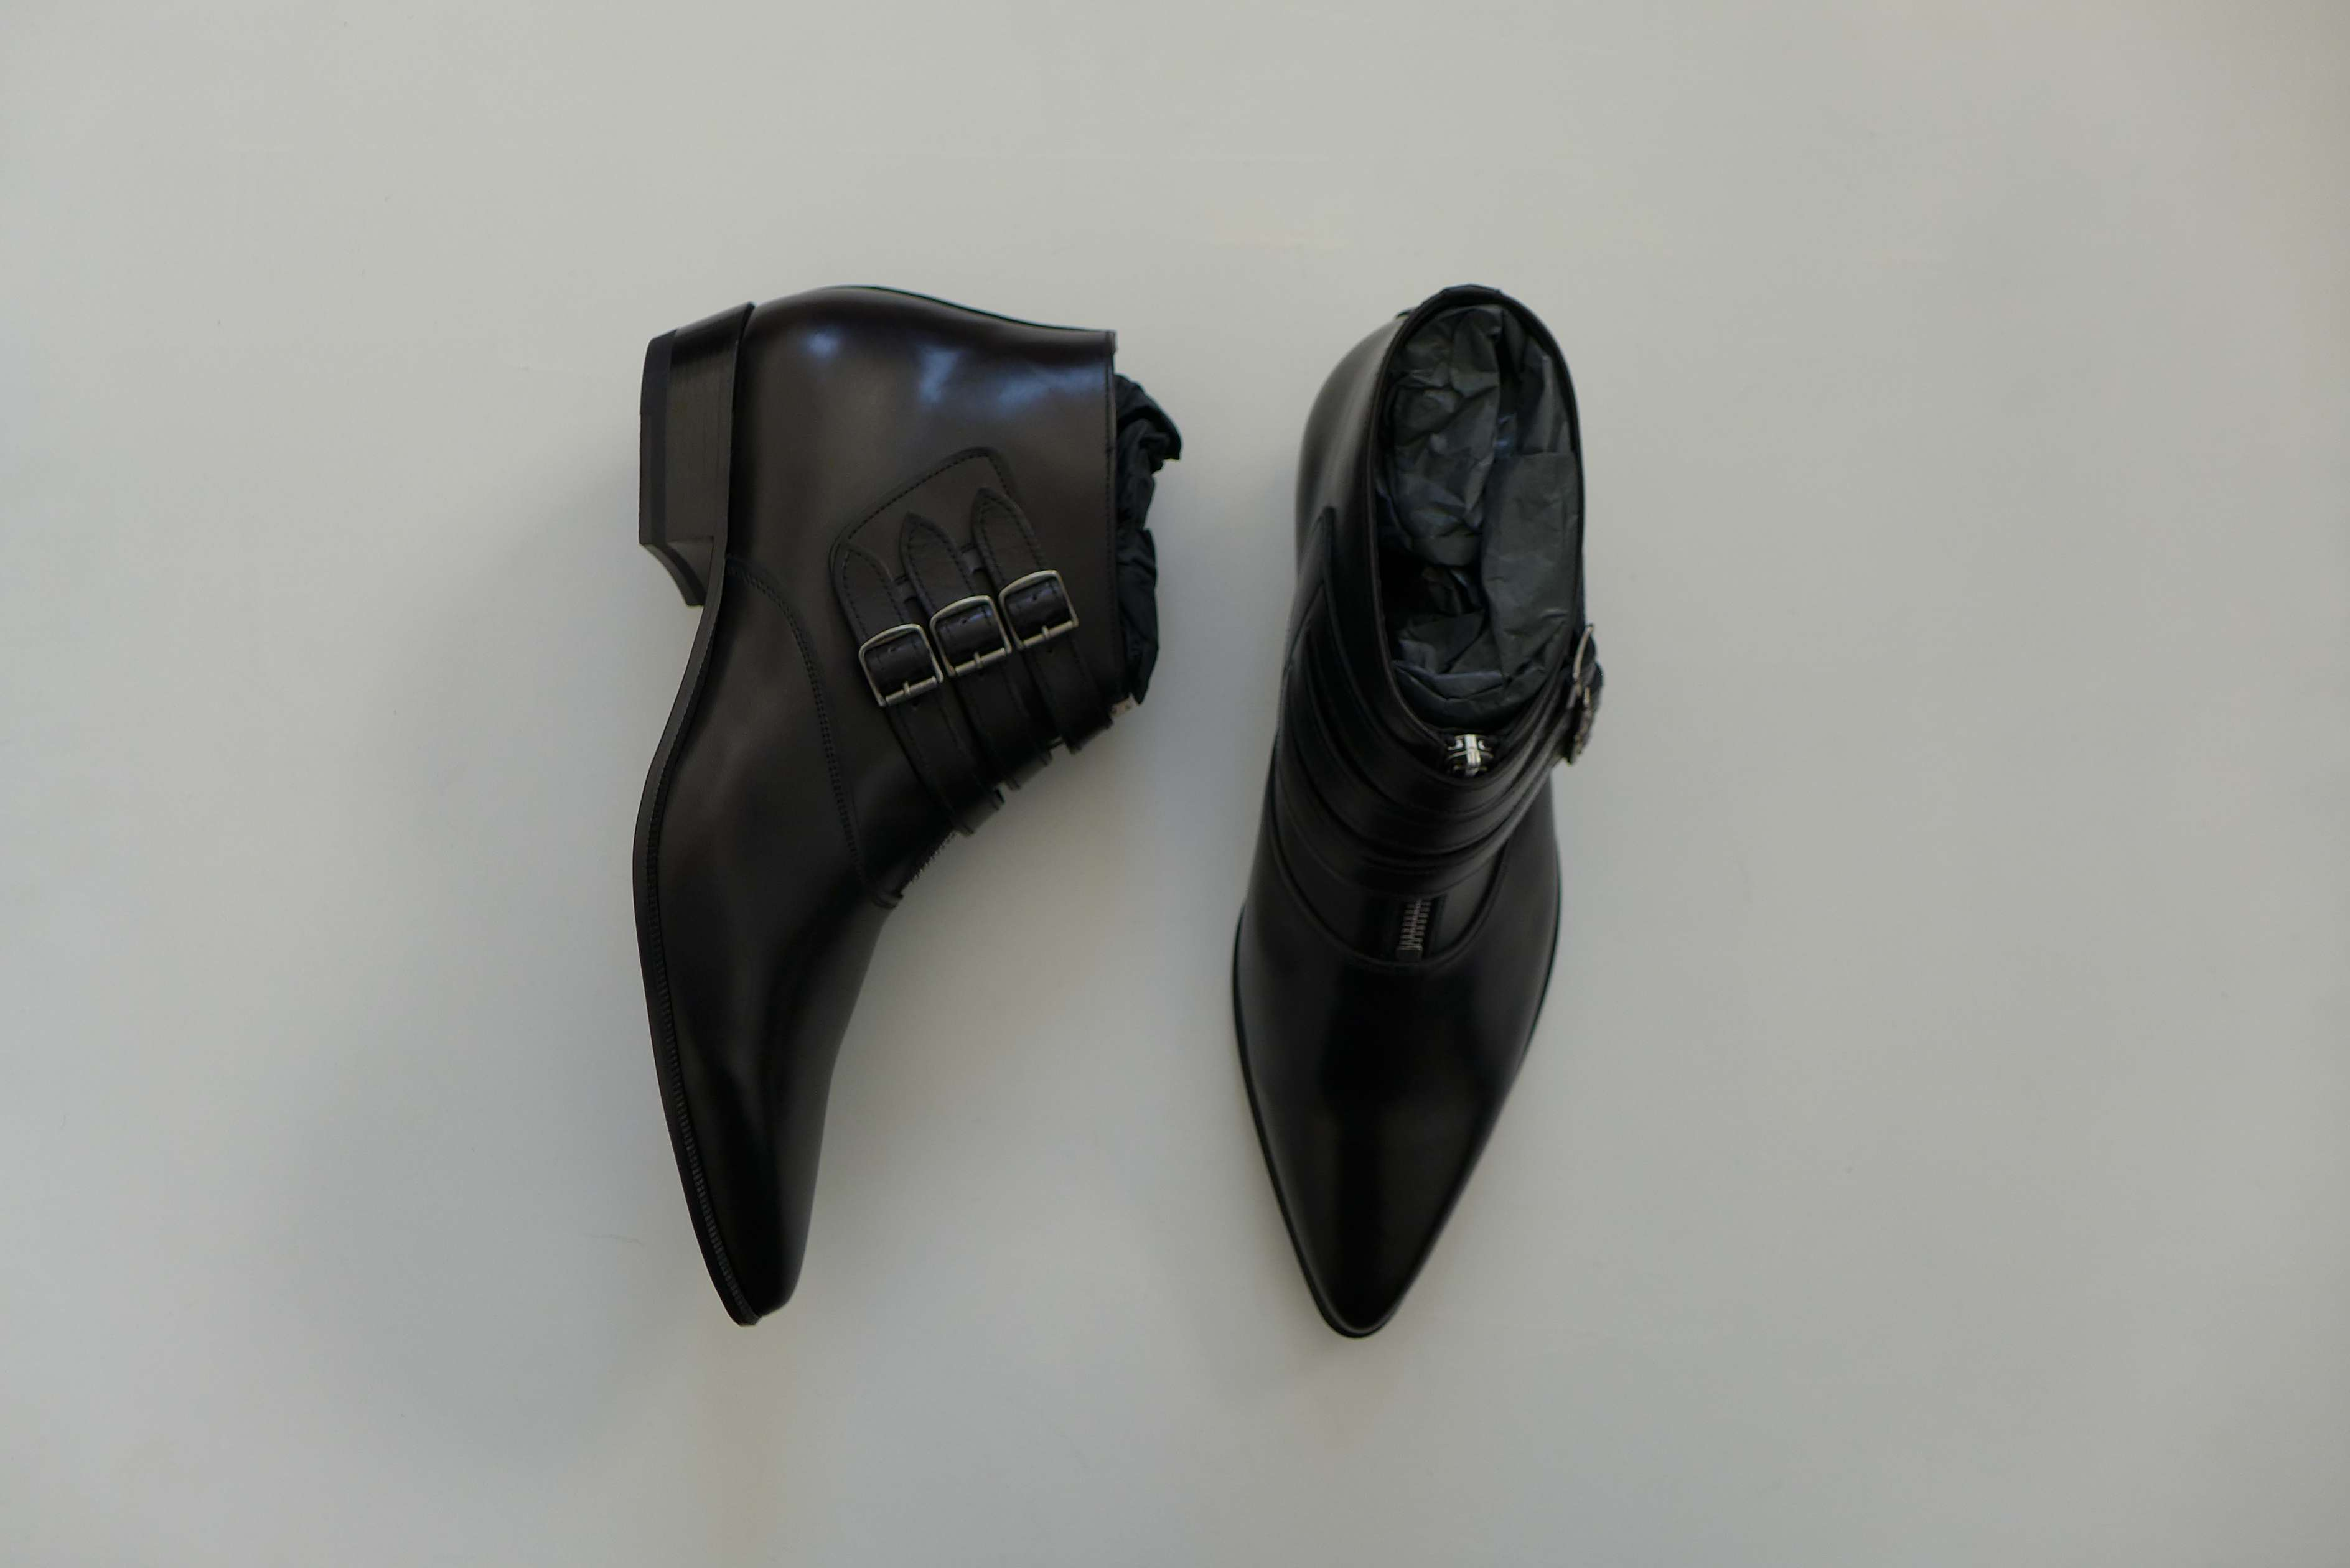 d0b2c3662ea SS14 Hedi Slimane Duckies Three Buckle Ankle Boots